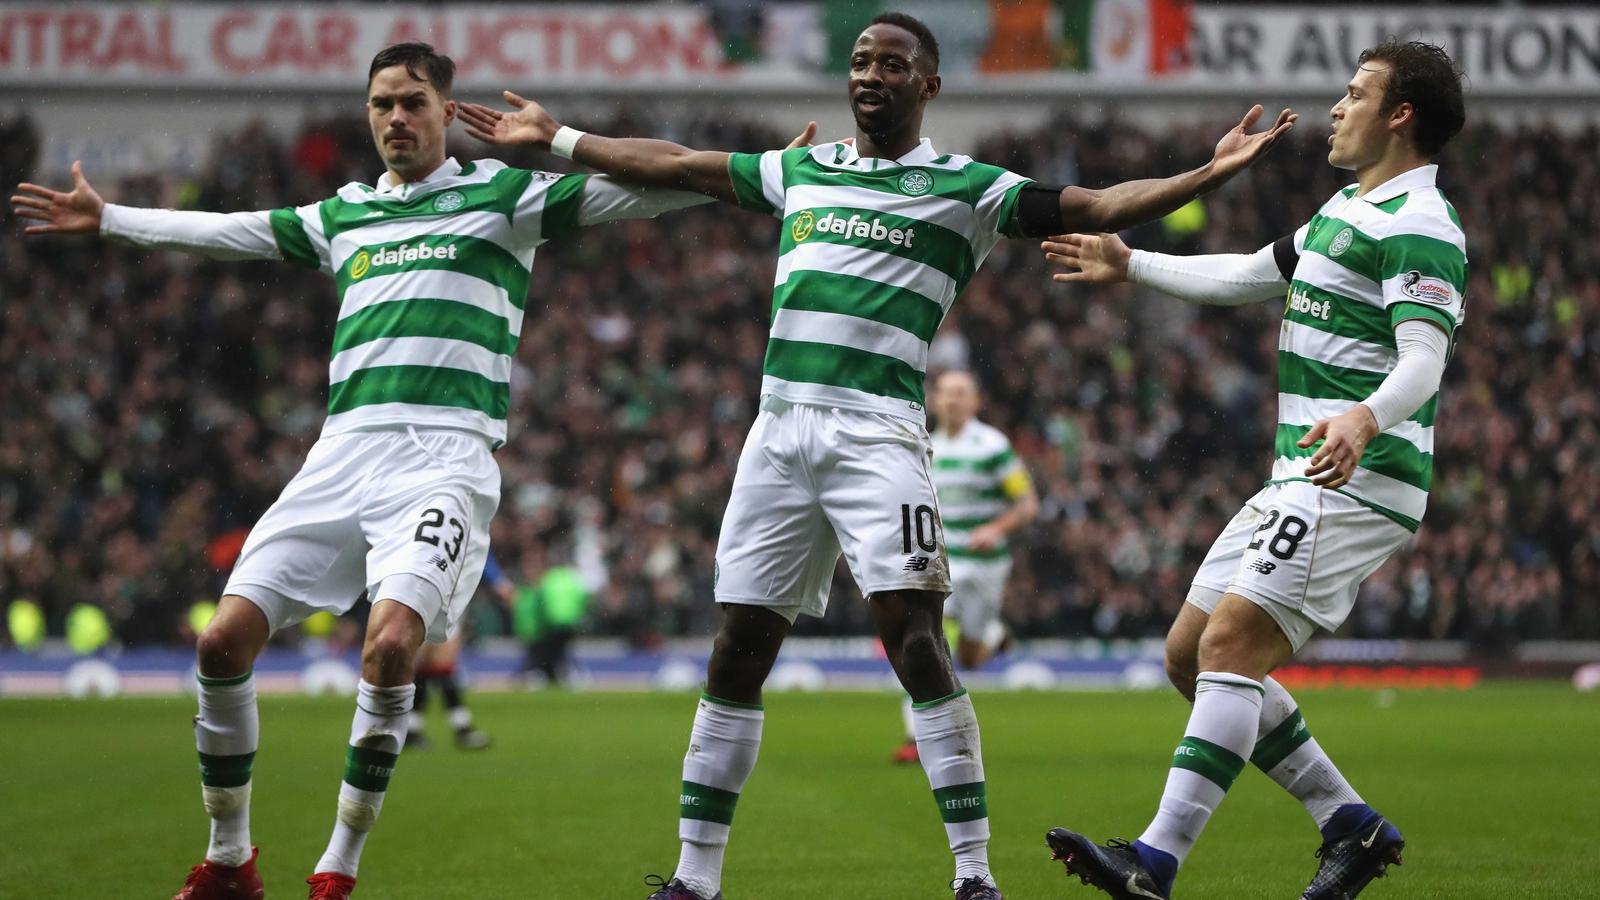 Routine win for Celtic in Scottish Premiership